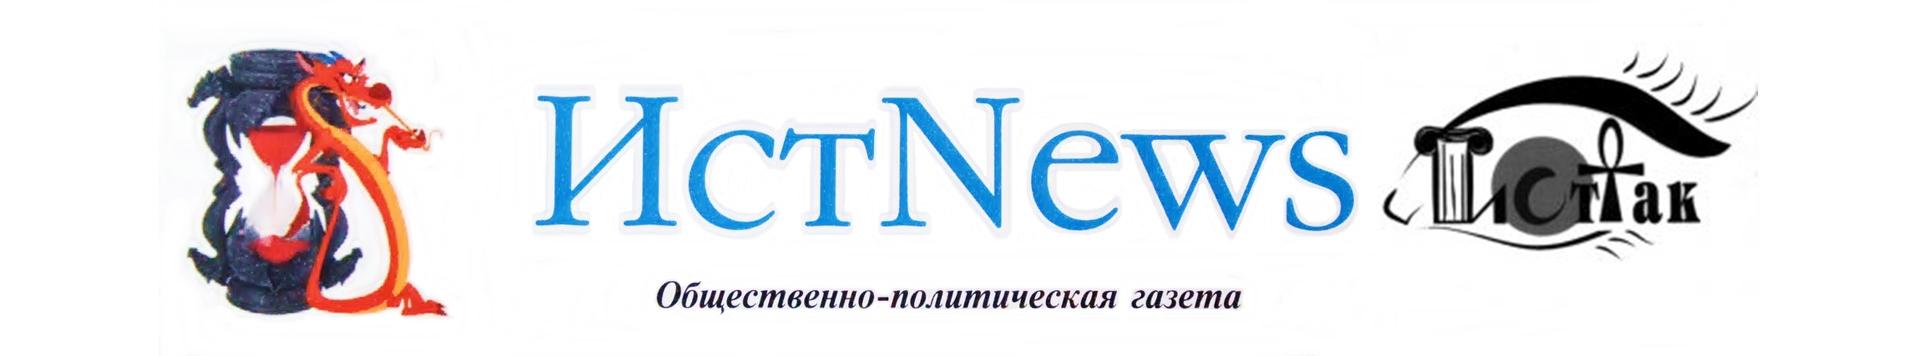 istnews1